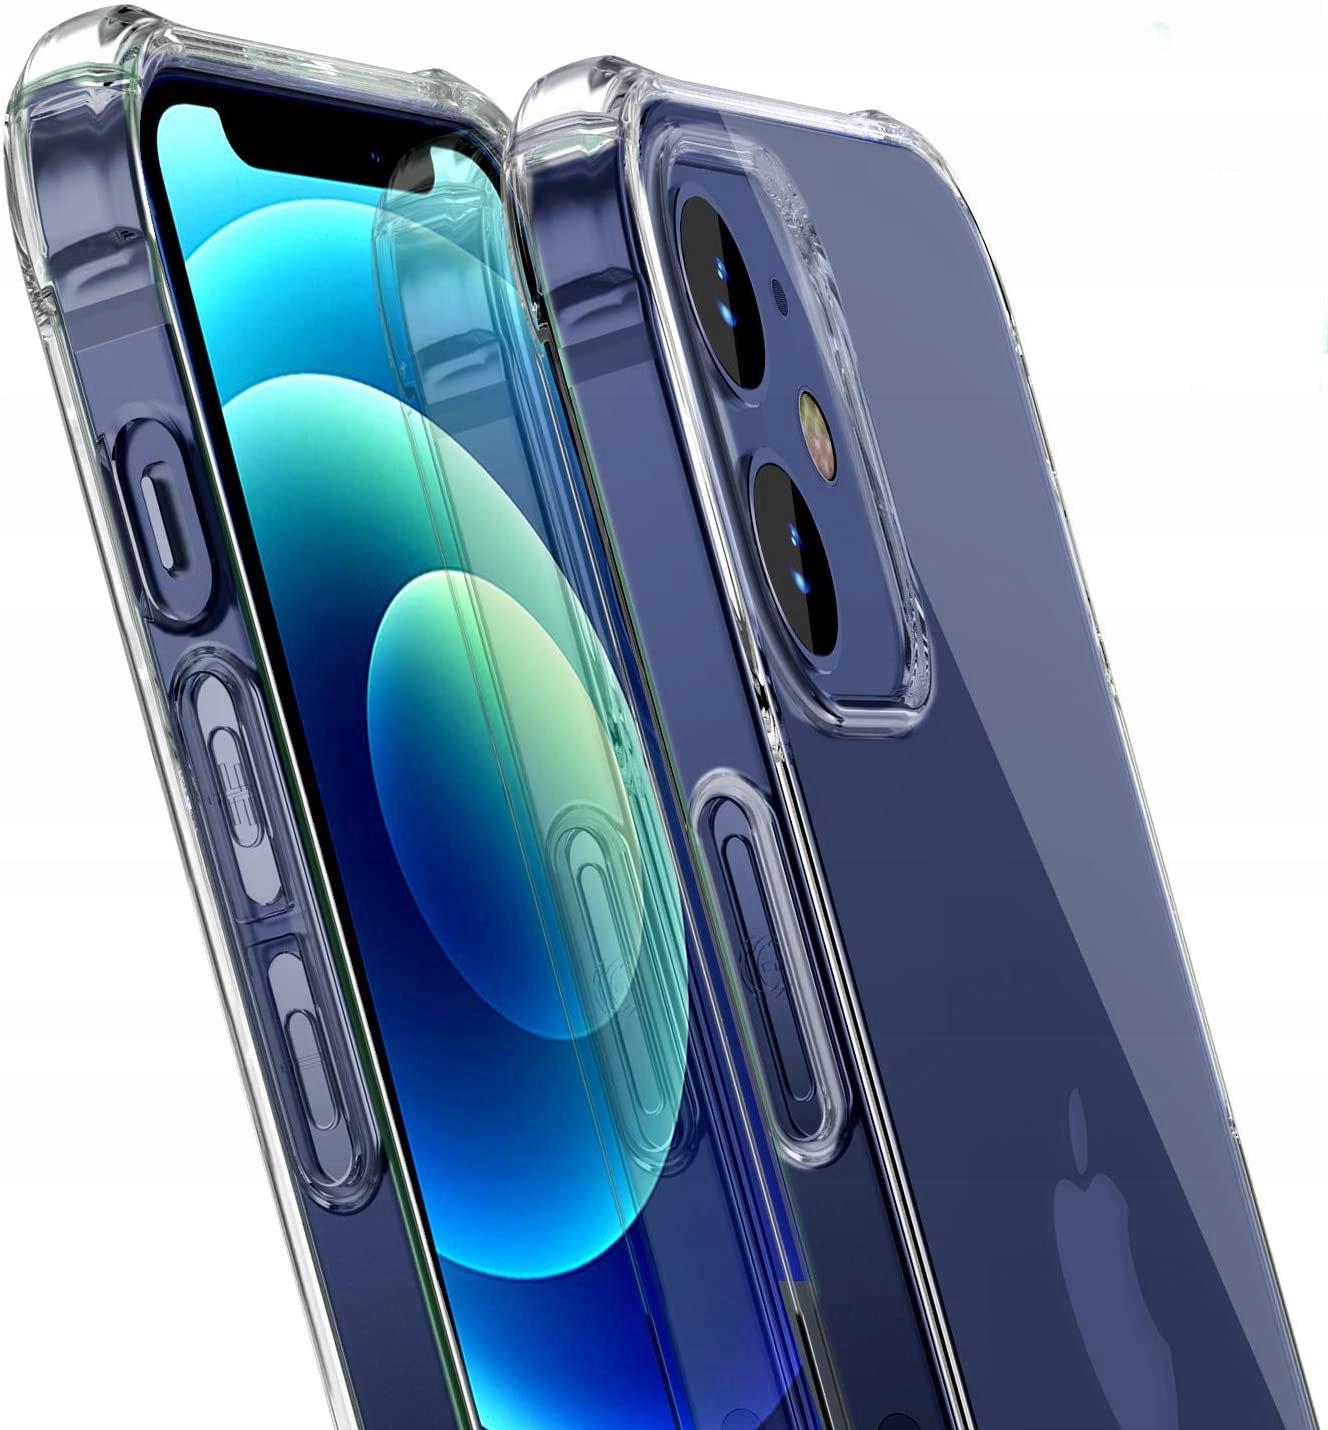 Etui do iPhone 12 ANTI-SHOCK Case + Szkło